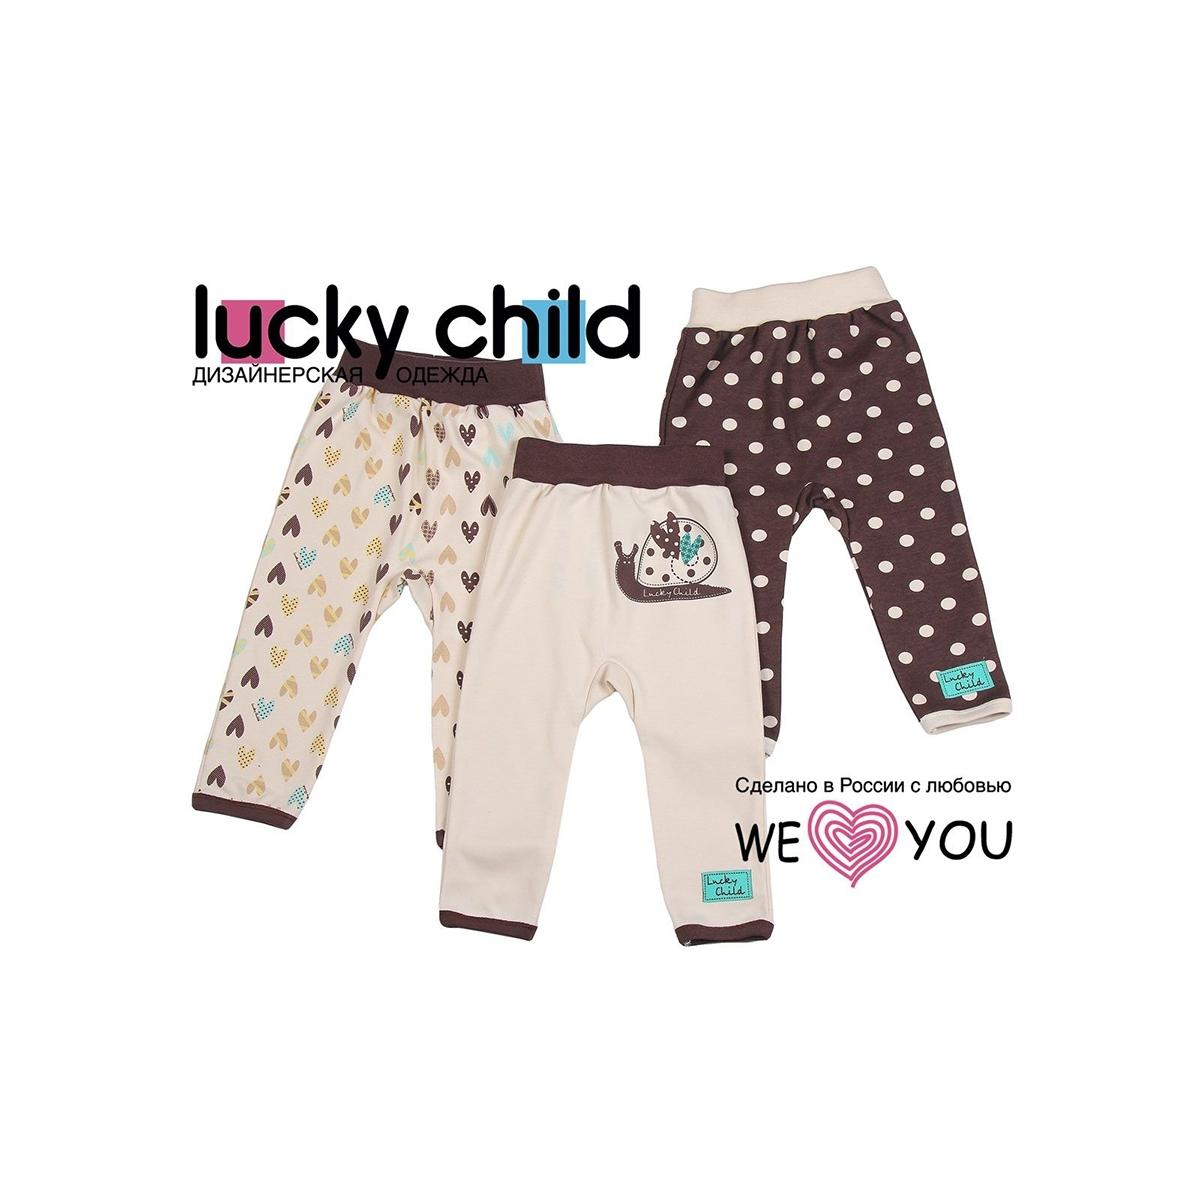 Комплект штанишки Lucky Child Улитки (3 шт) рост 92 от Младенец.ru